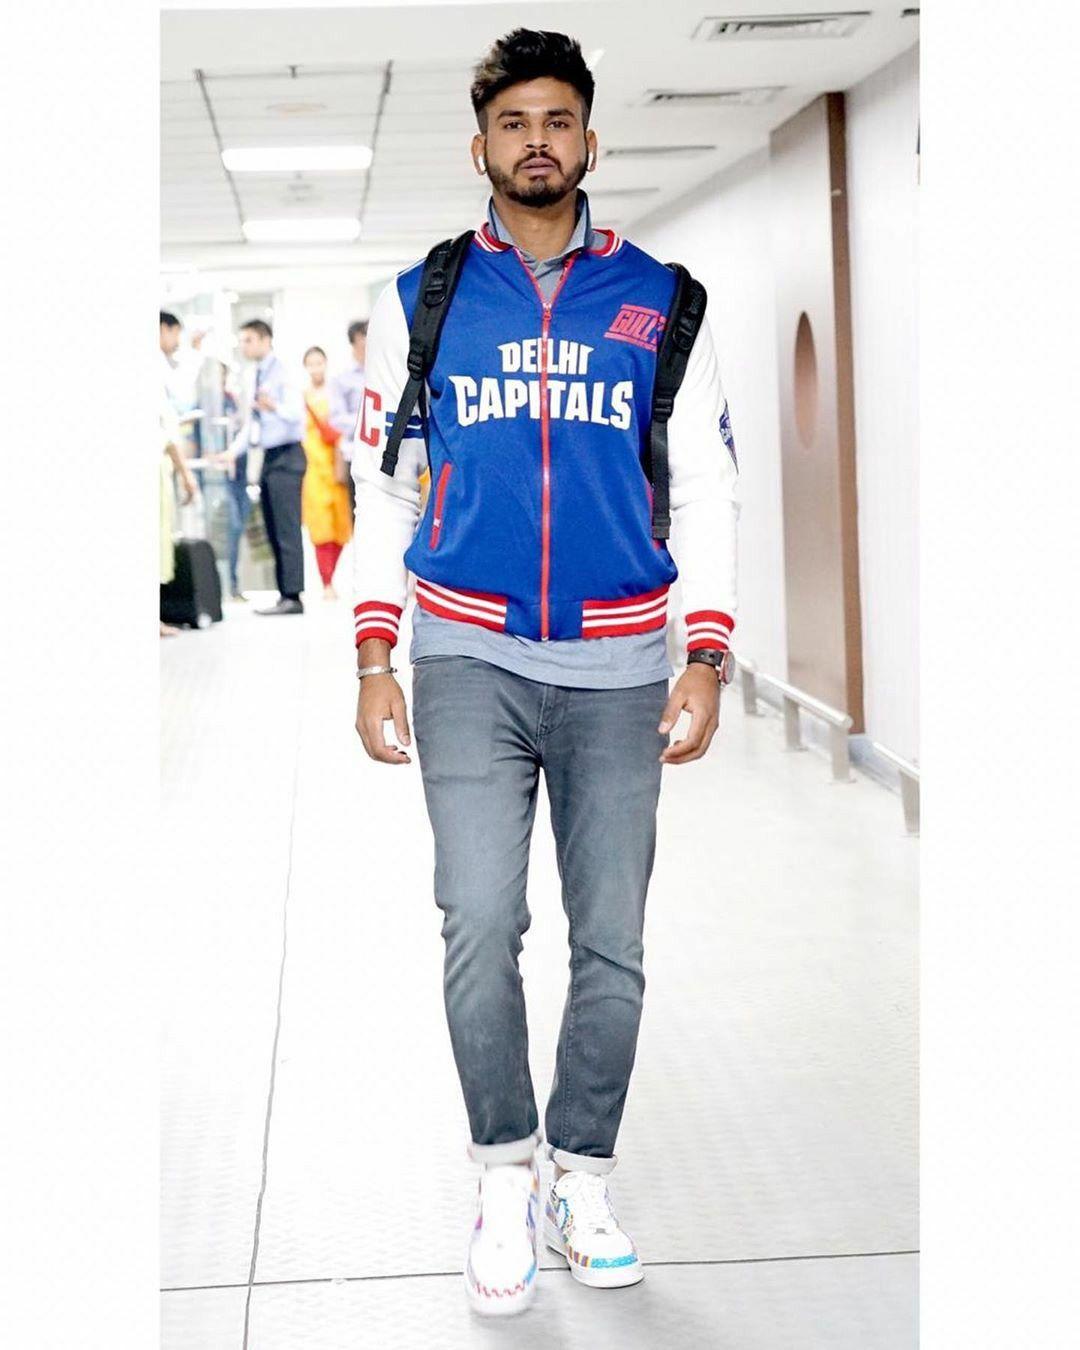 Shreyas Iyer ÇÅ🏏 Cricket sport, Sports stars, Sports